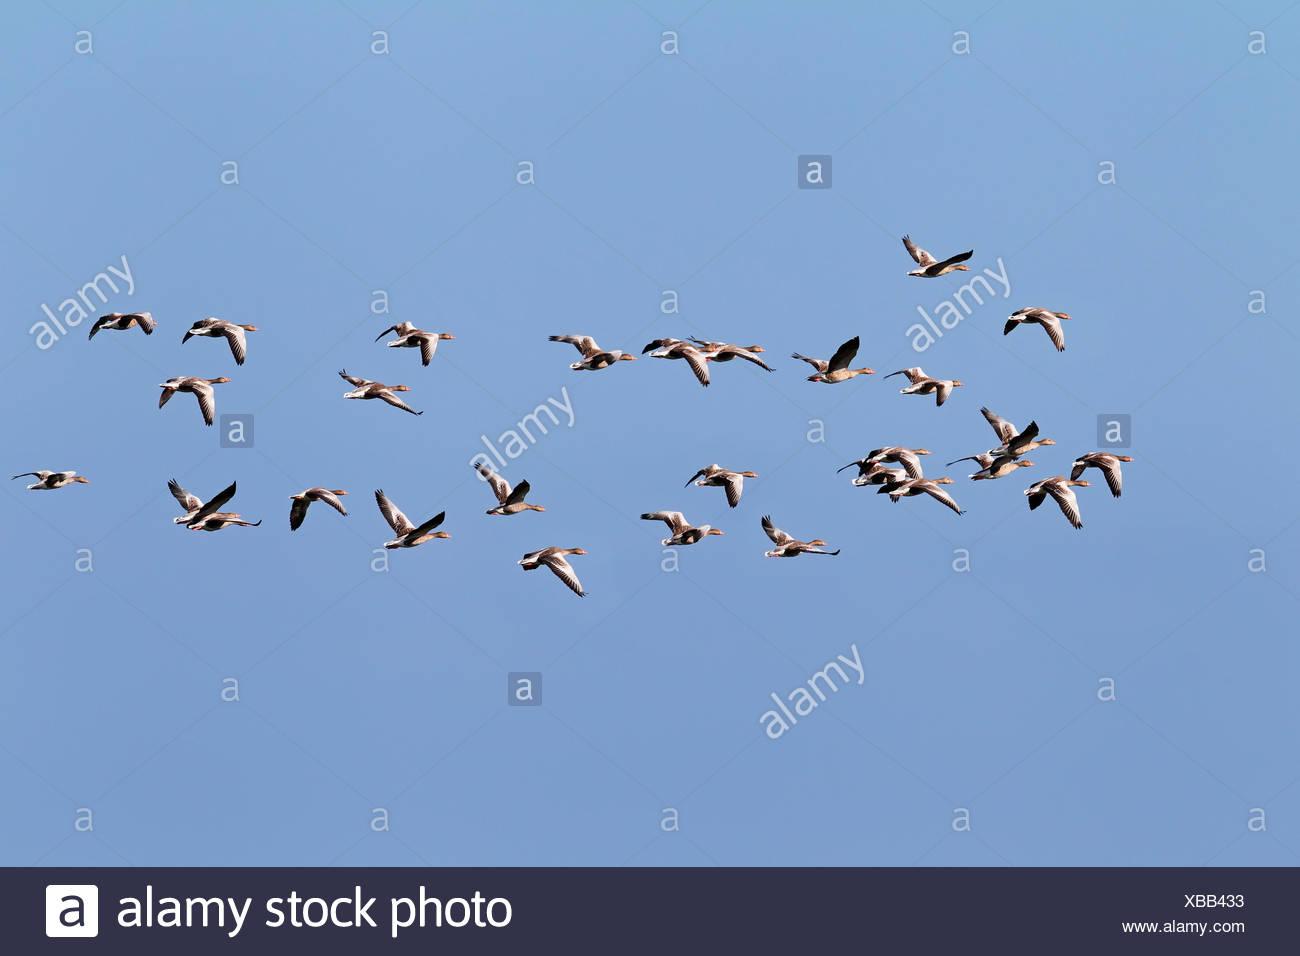 Flying greylag geese (Anser anser), bird migration, fall migration, Western Pomerania Lagoon Area National Park - Stock Image